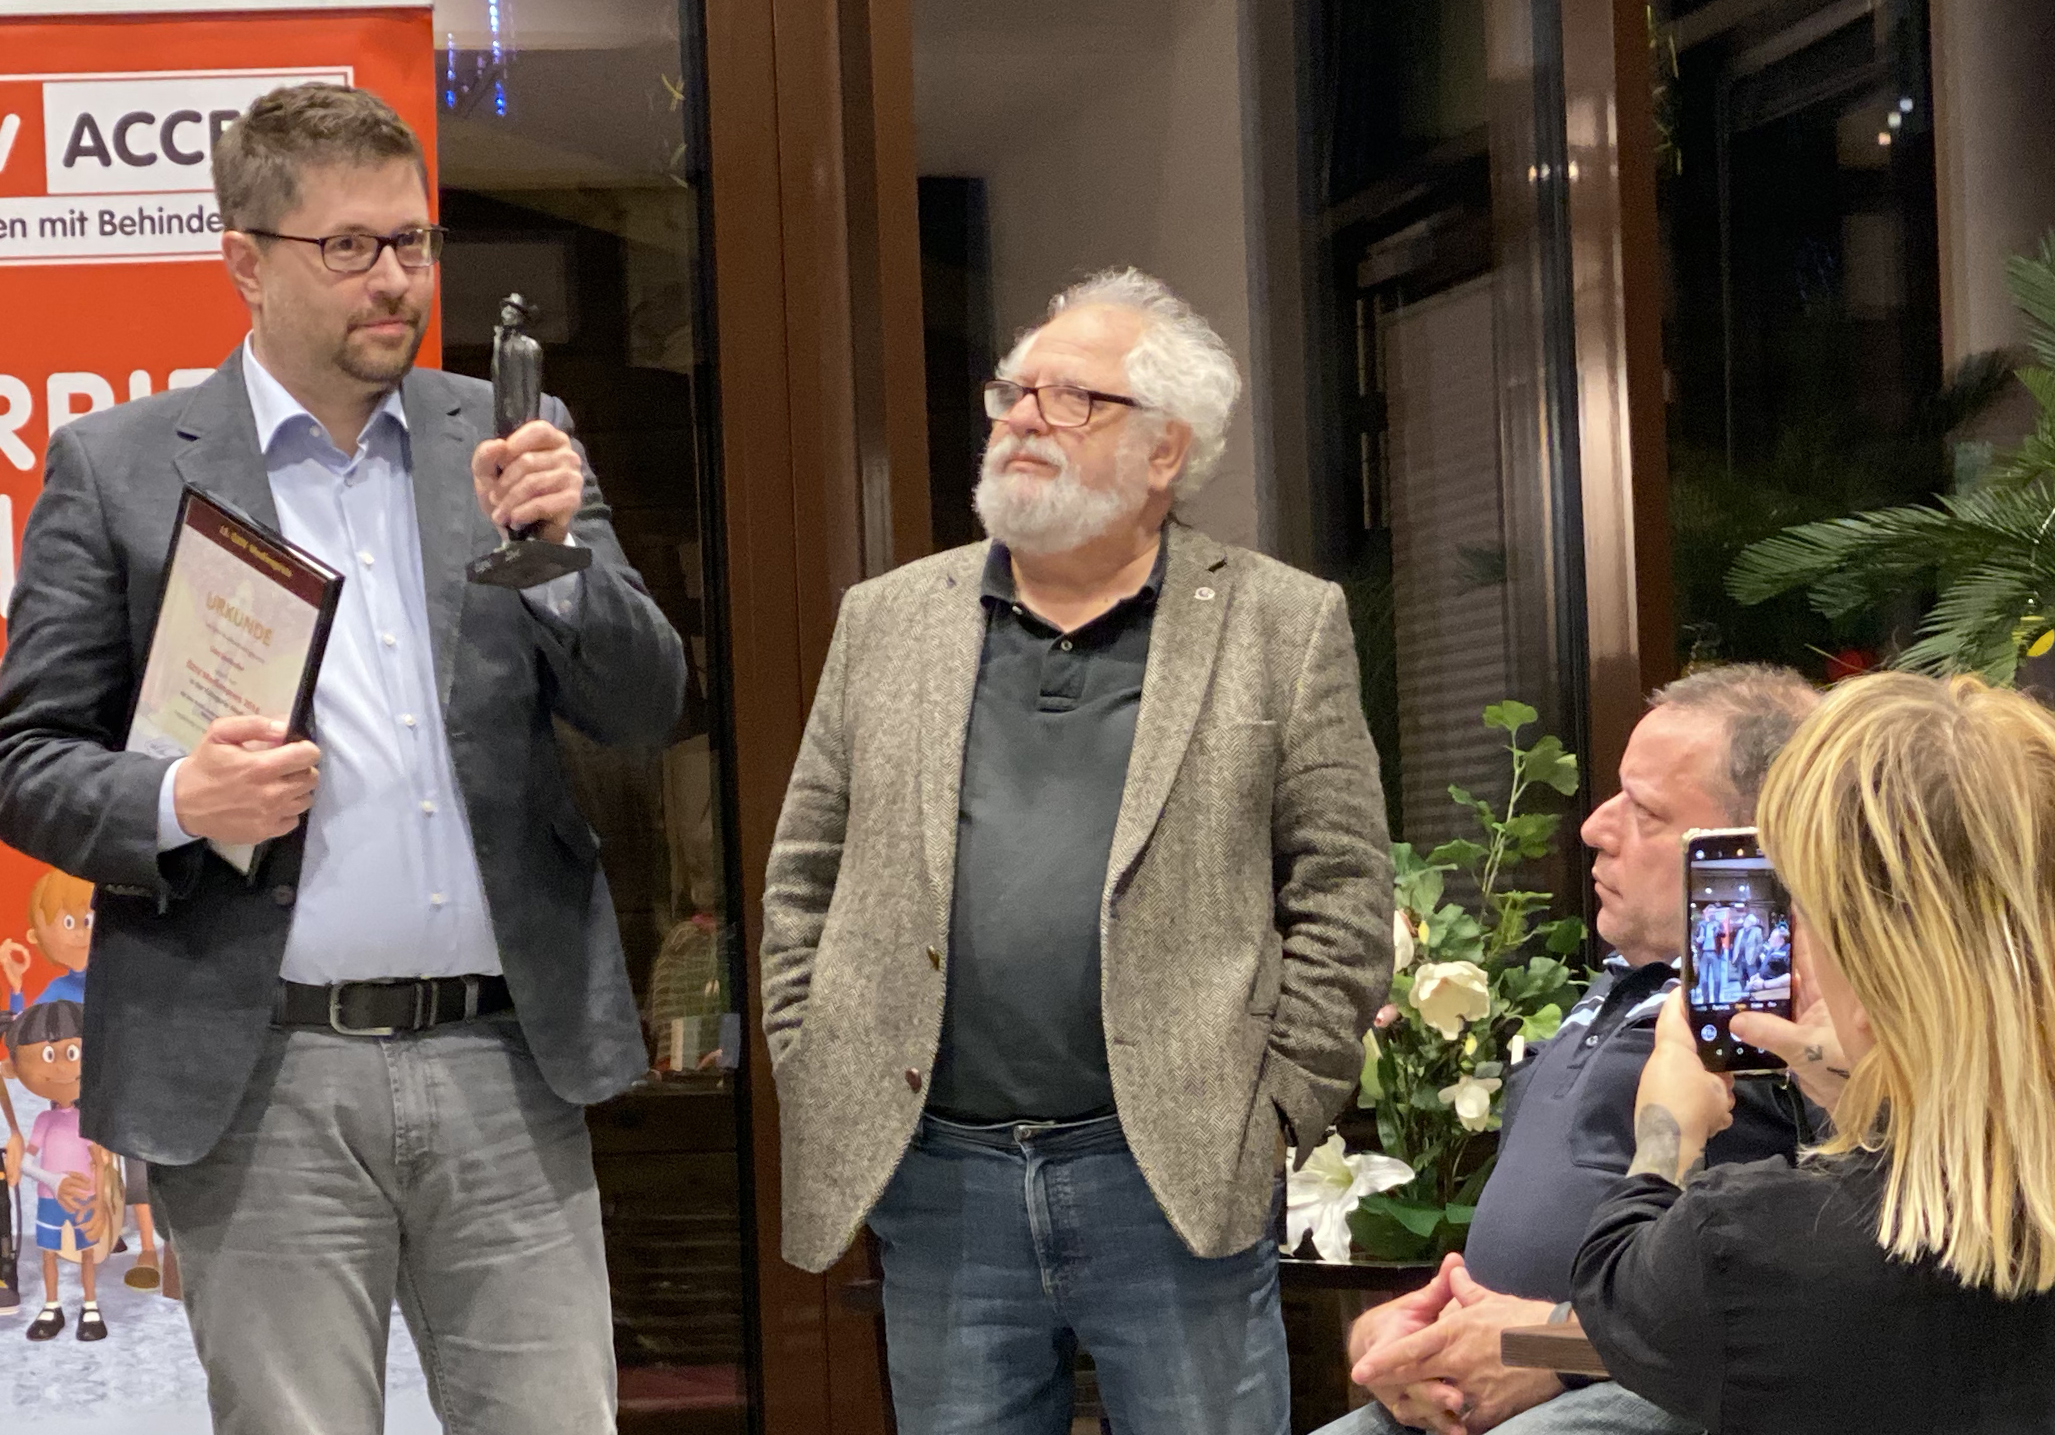 Udo Seelhofer übernimmt Preis